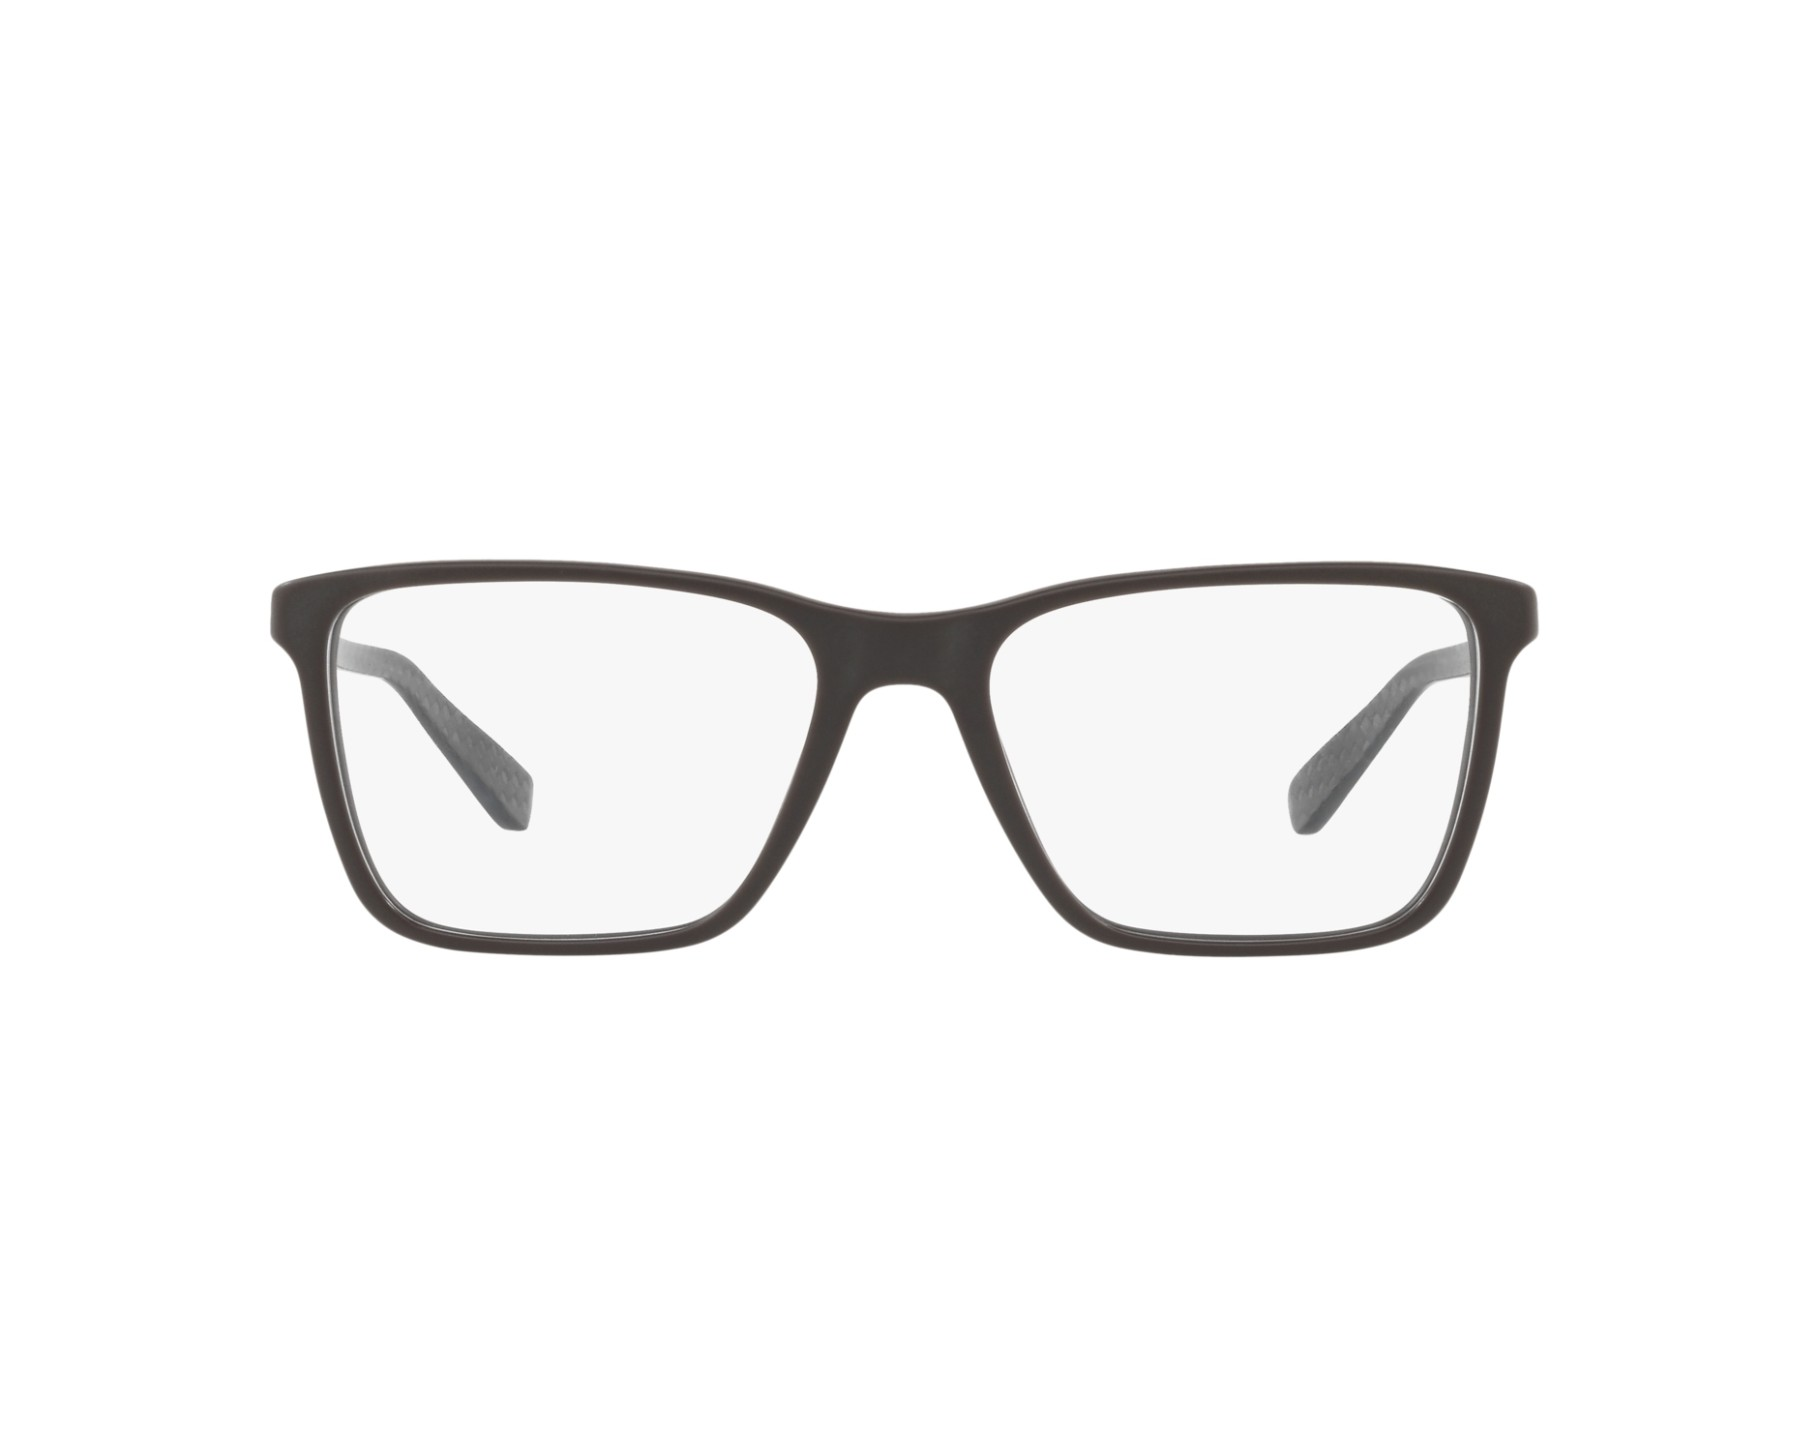 Buy Ralph Lauren Eyeglasses RL-6163 5643 Online - Visionet